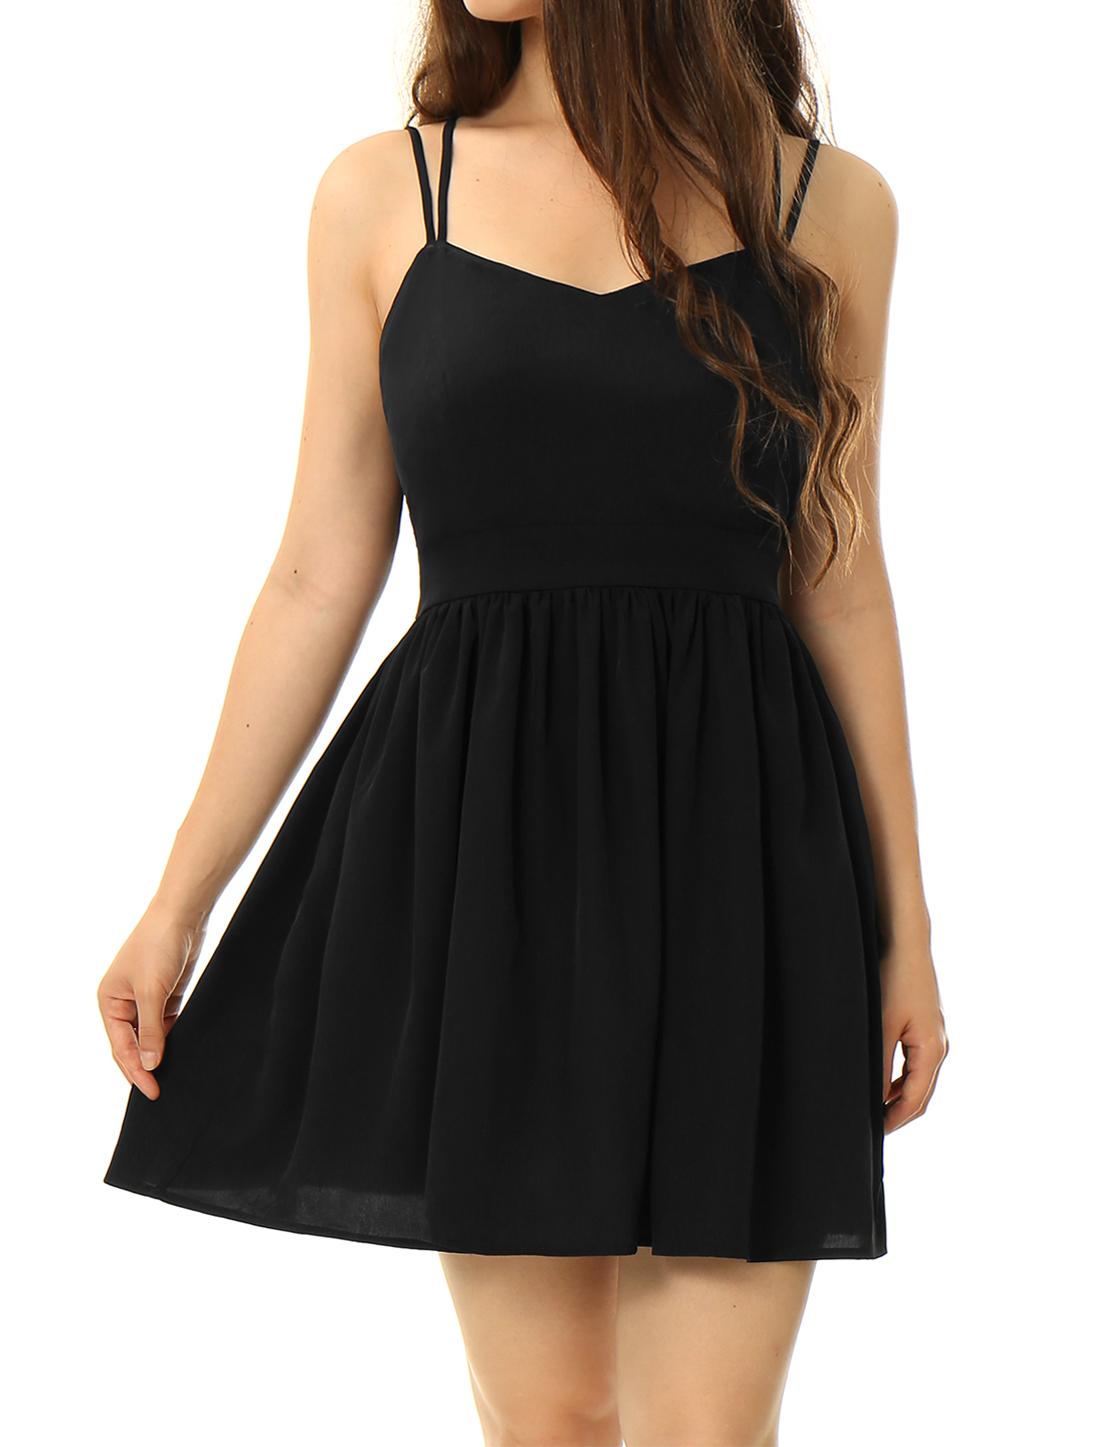 Women Dual Spaghetti Straps Criss Cross Back Mini Dress Black M